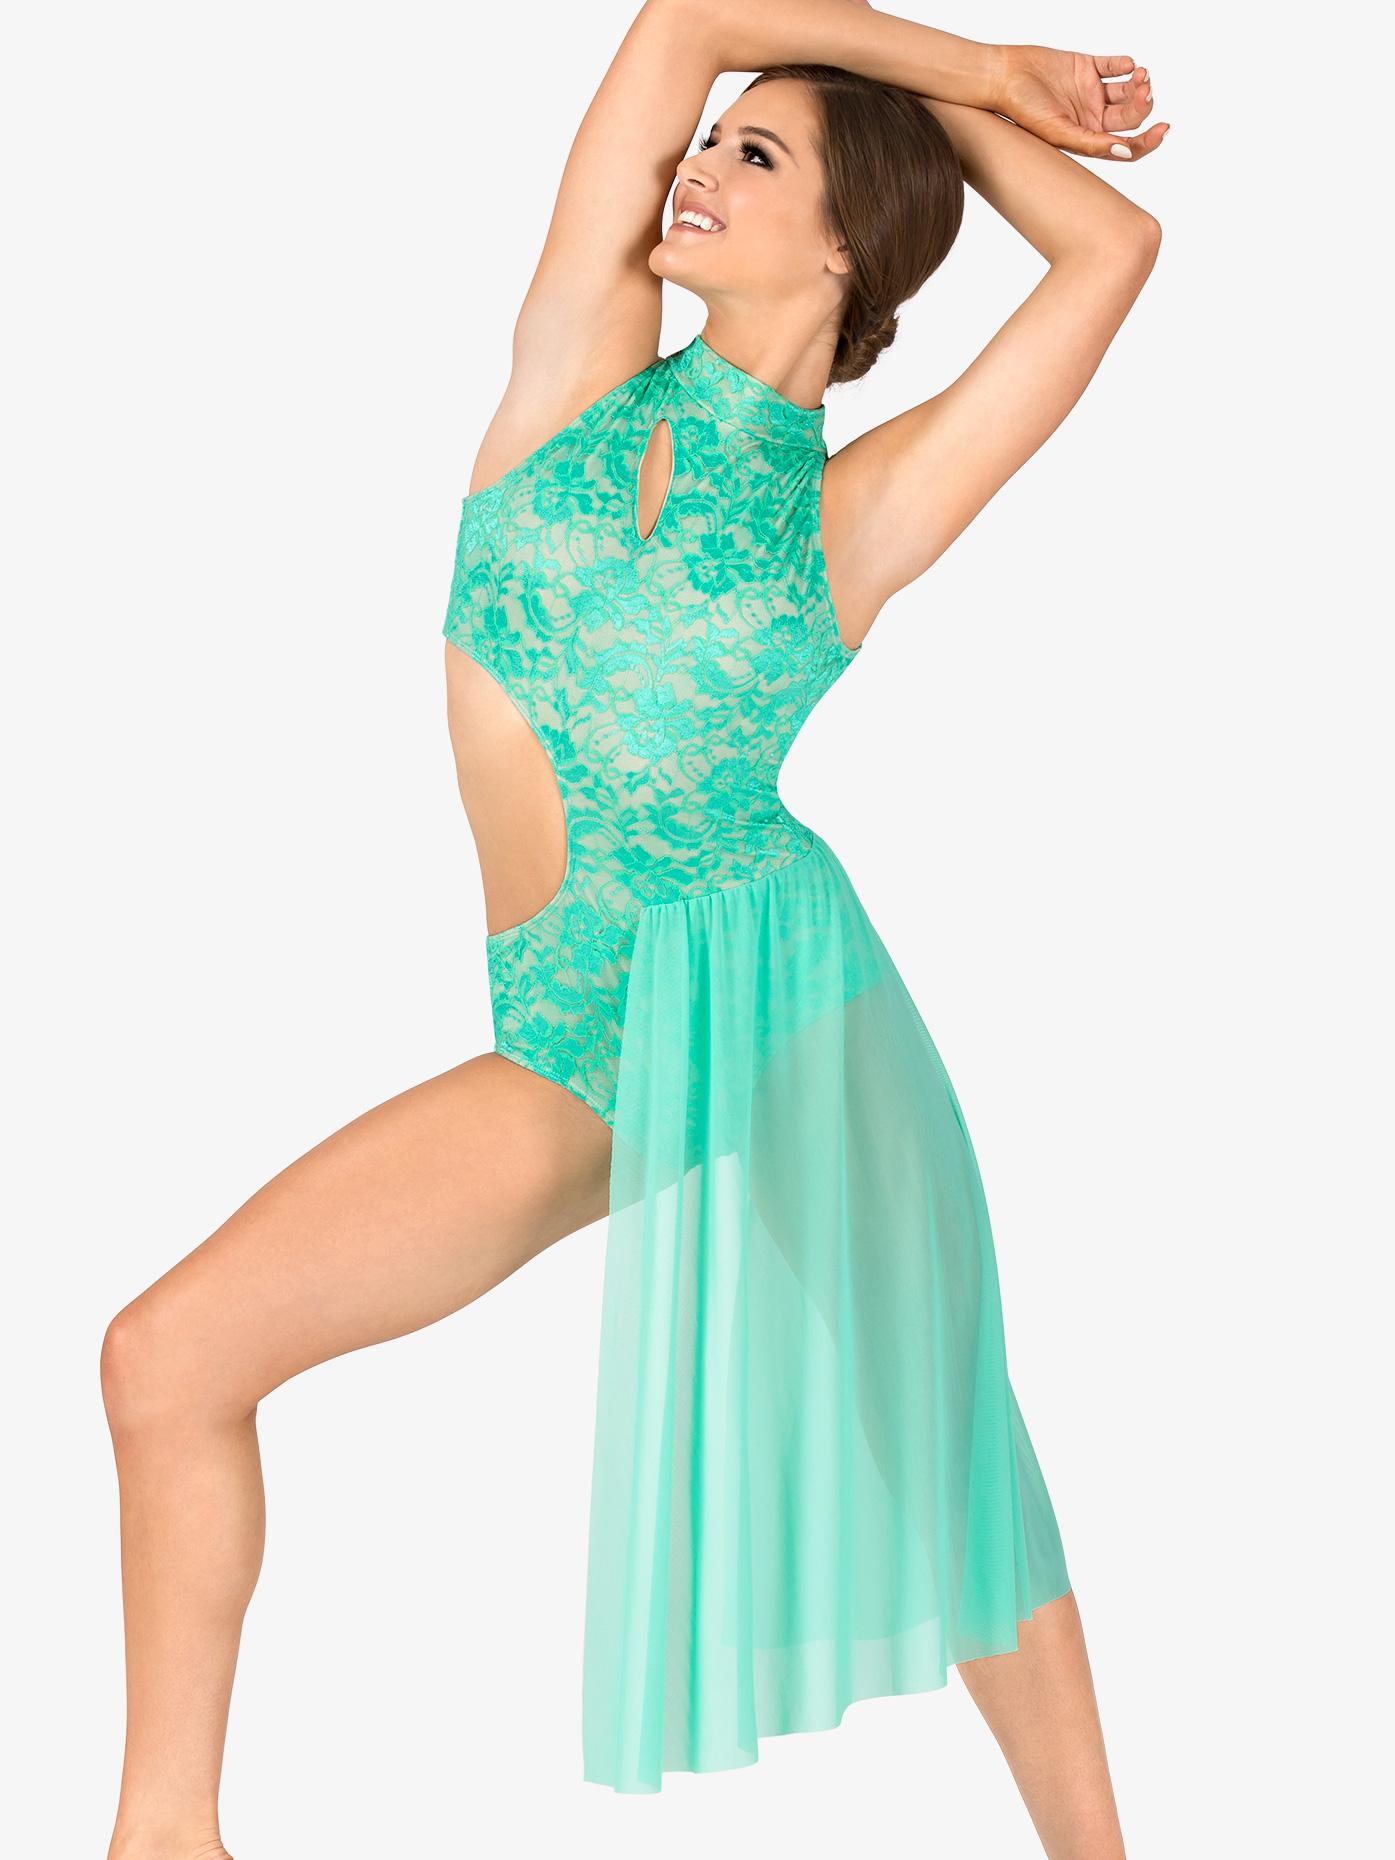 Double Platinum Womens Performance Lace Mock Neck Asymmetrical Dress N7561